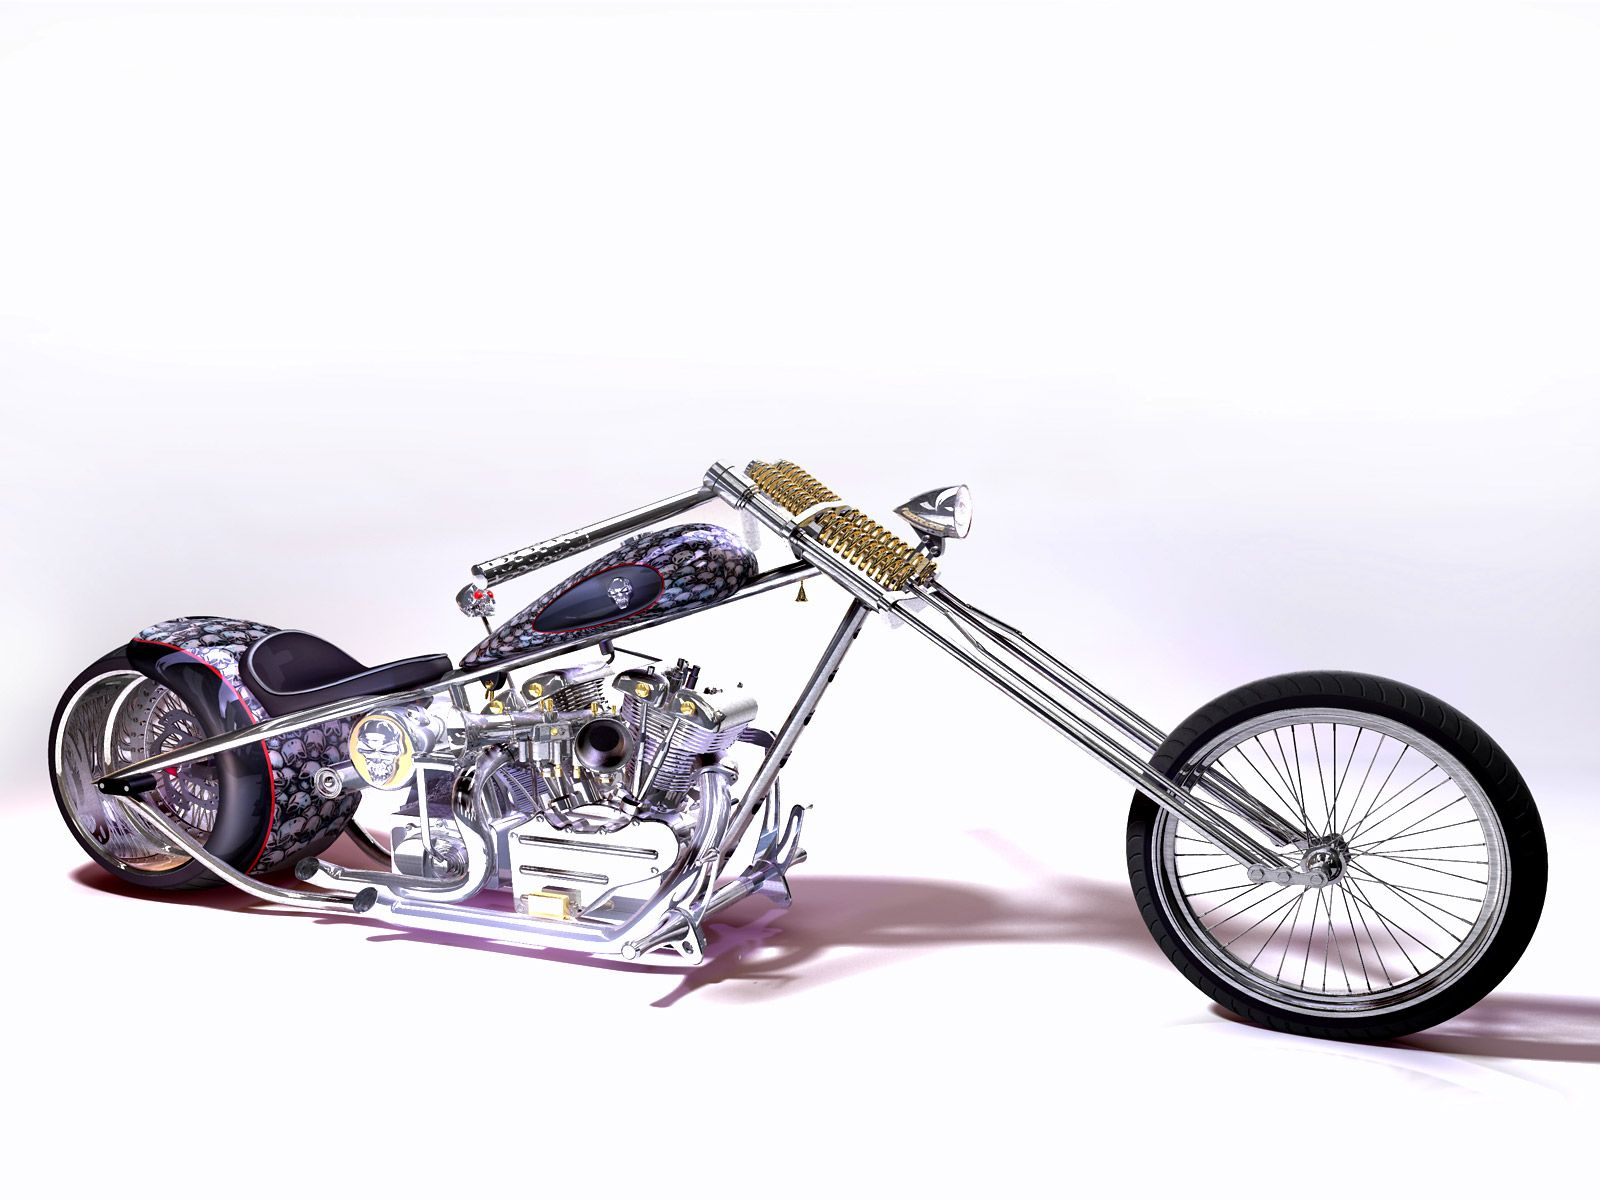 3dbikes 3d bikes pinterest choppers wheels and harley davidson harley davidson wallpaper id 517294 desktop nexus motorcycles voltagebd Images